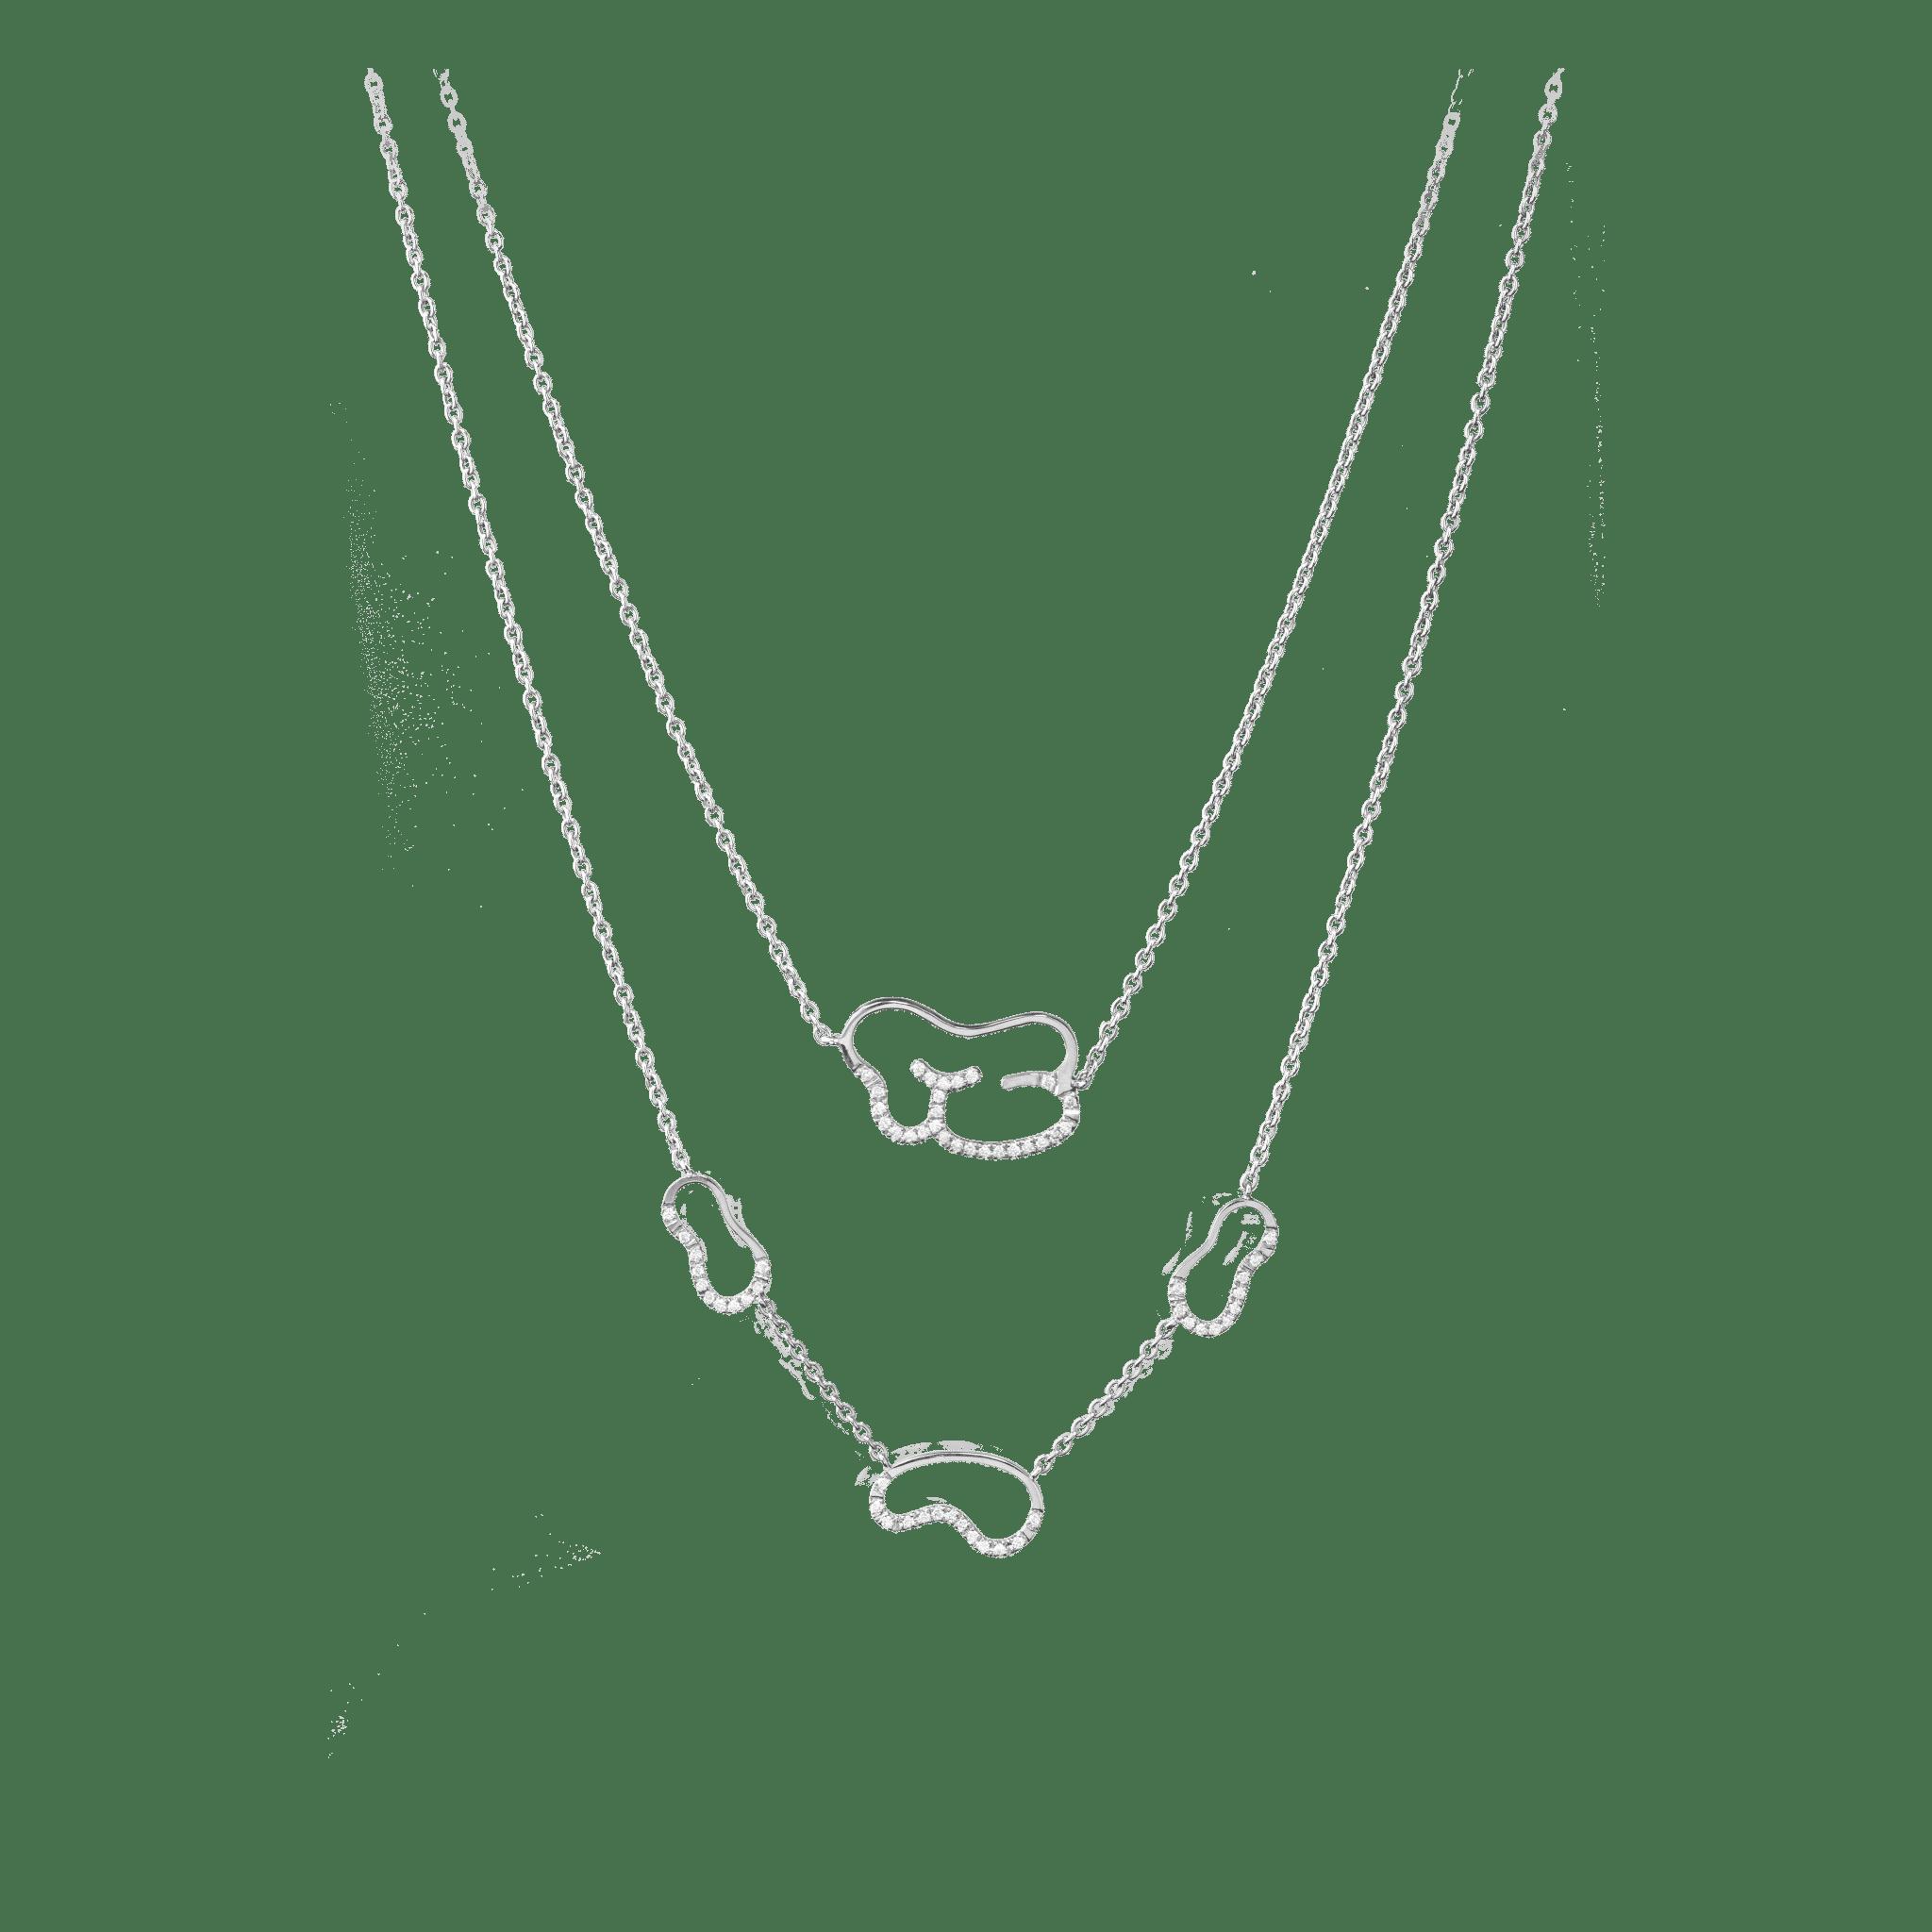 empreinte collier or blanc diamant